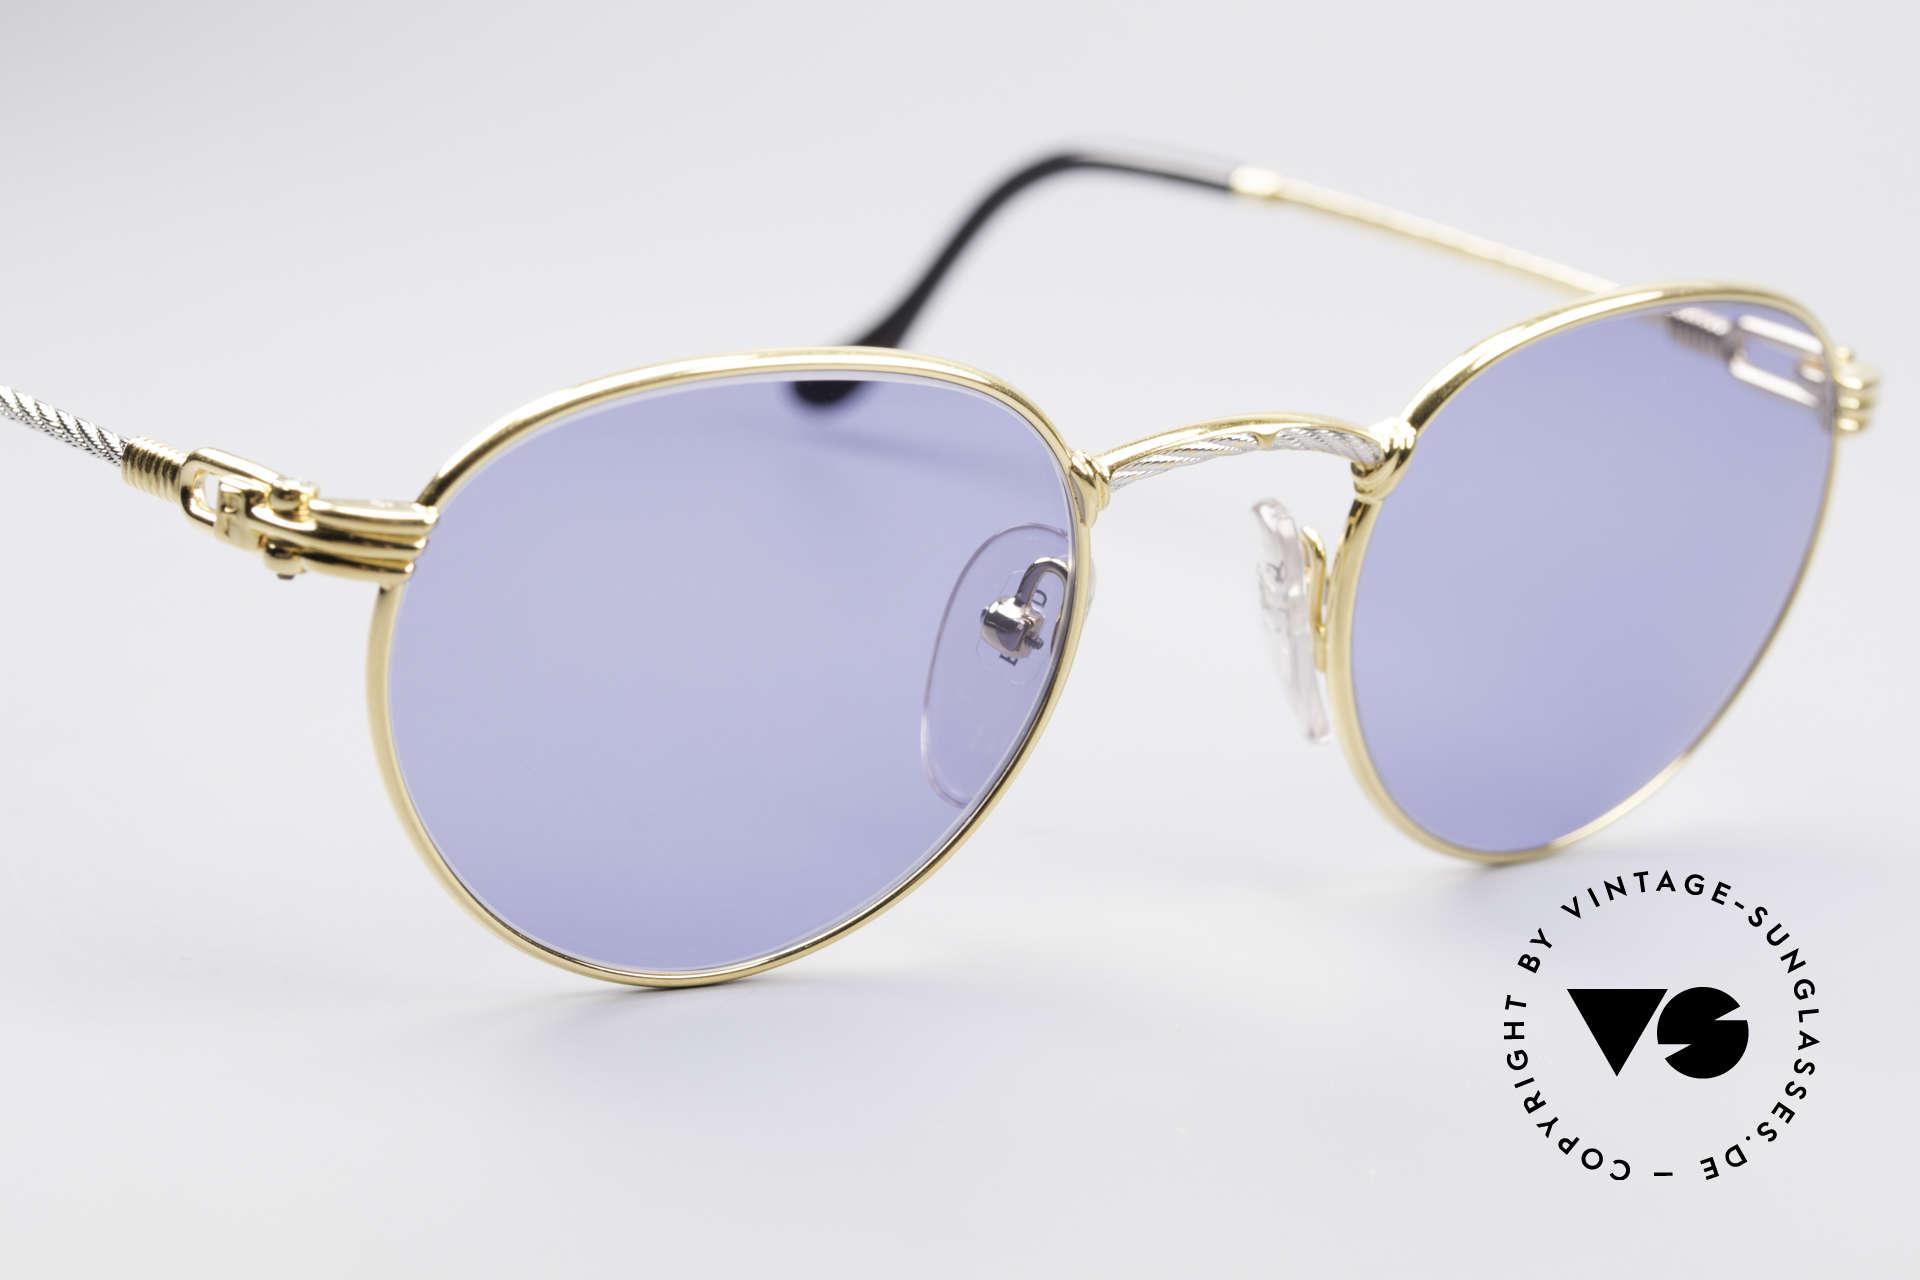 Fred Ouragan Luxury Panto Sunglasses, precious bicolor edition: size 48°21 + orig. box & case, Made for Men